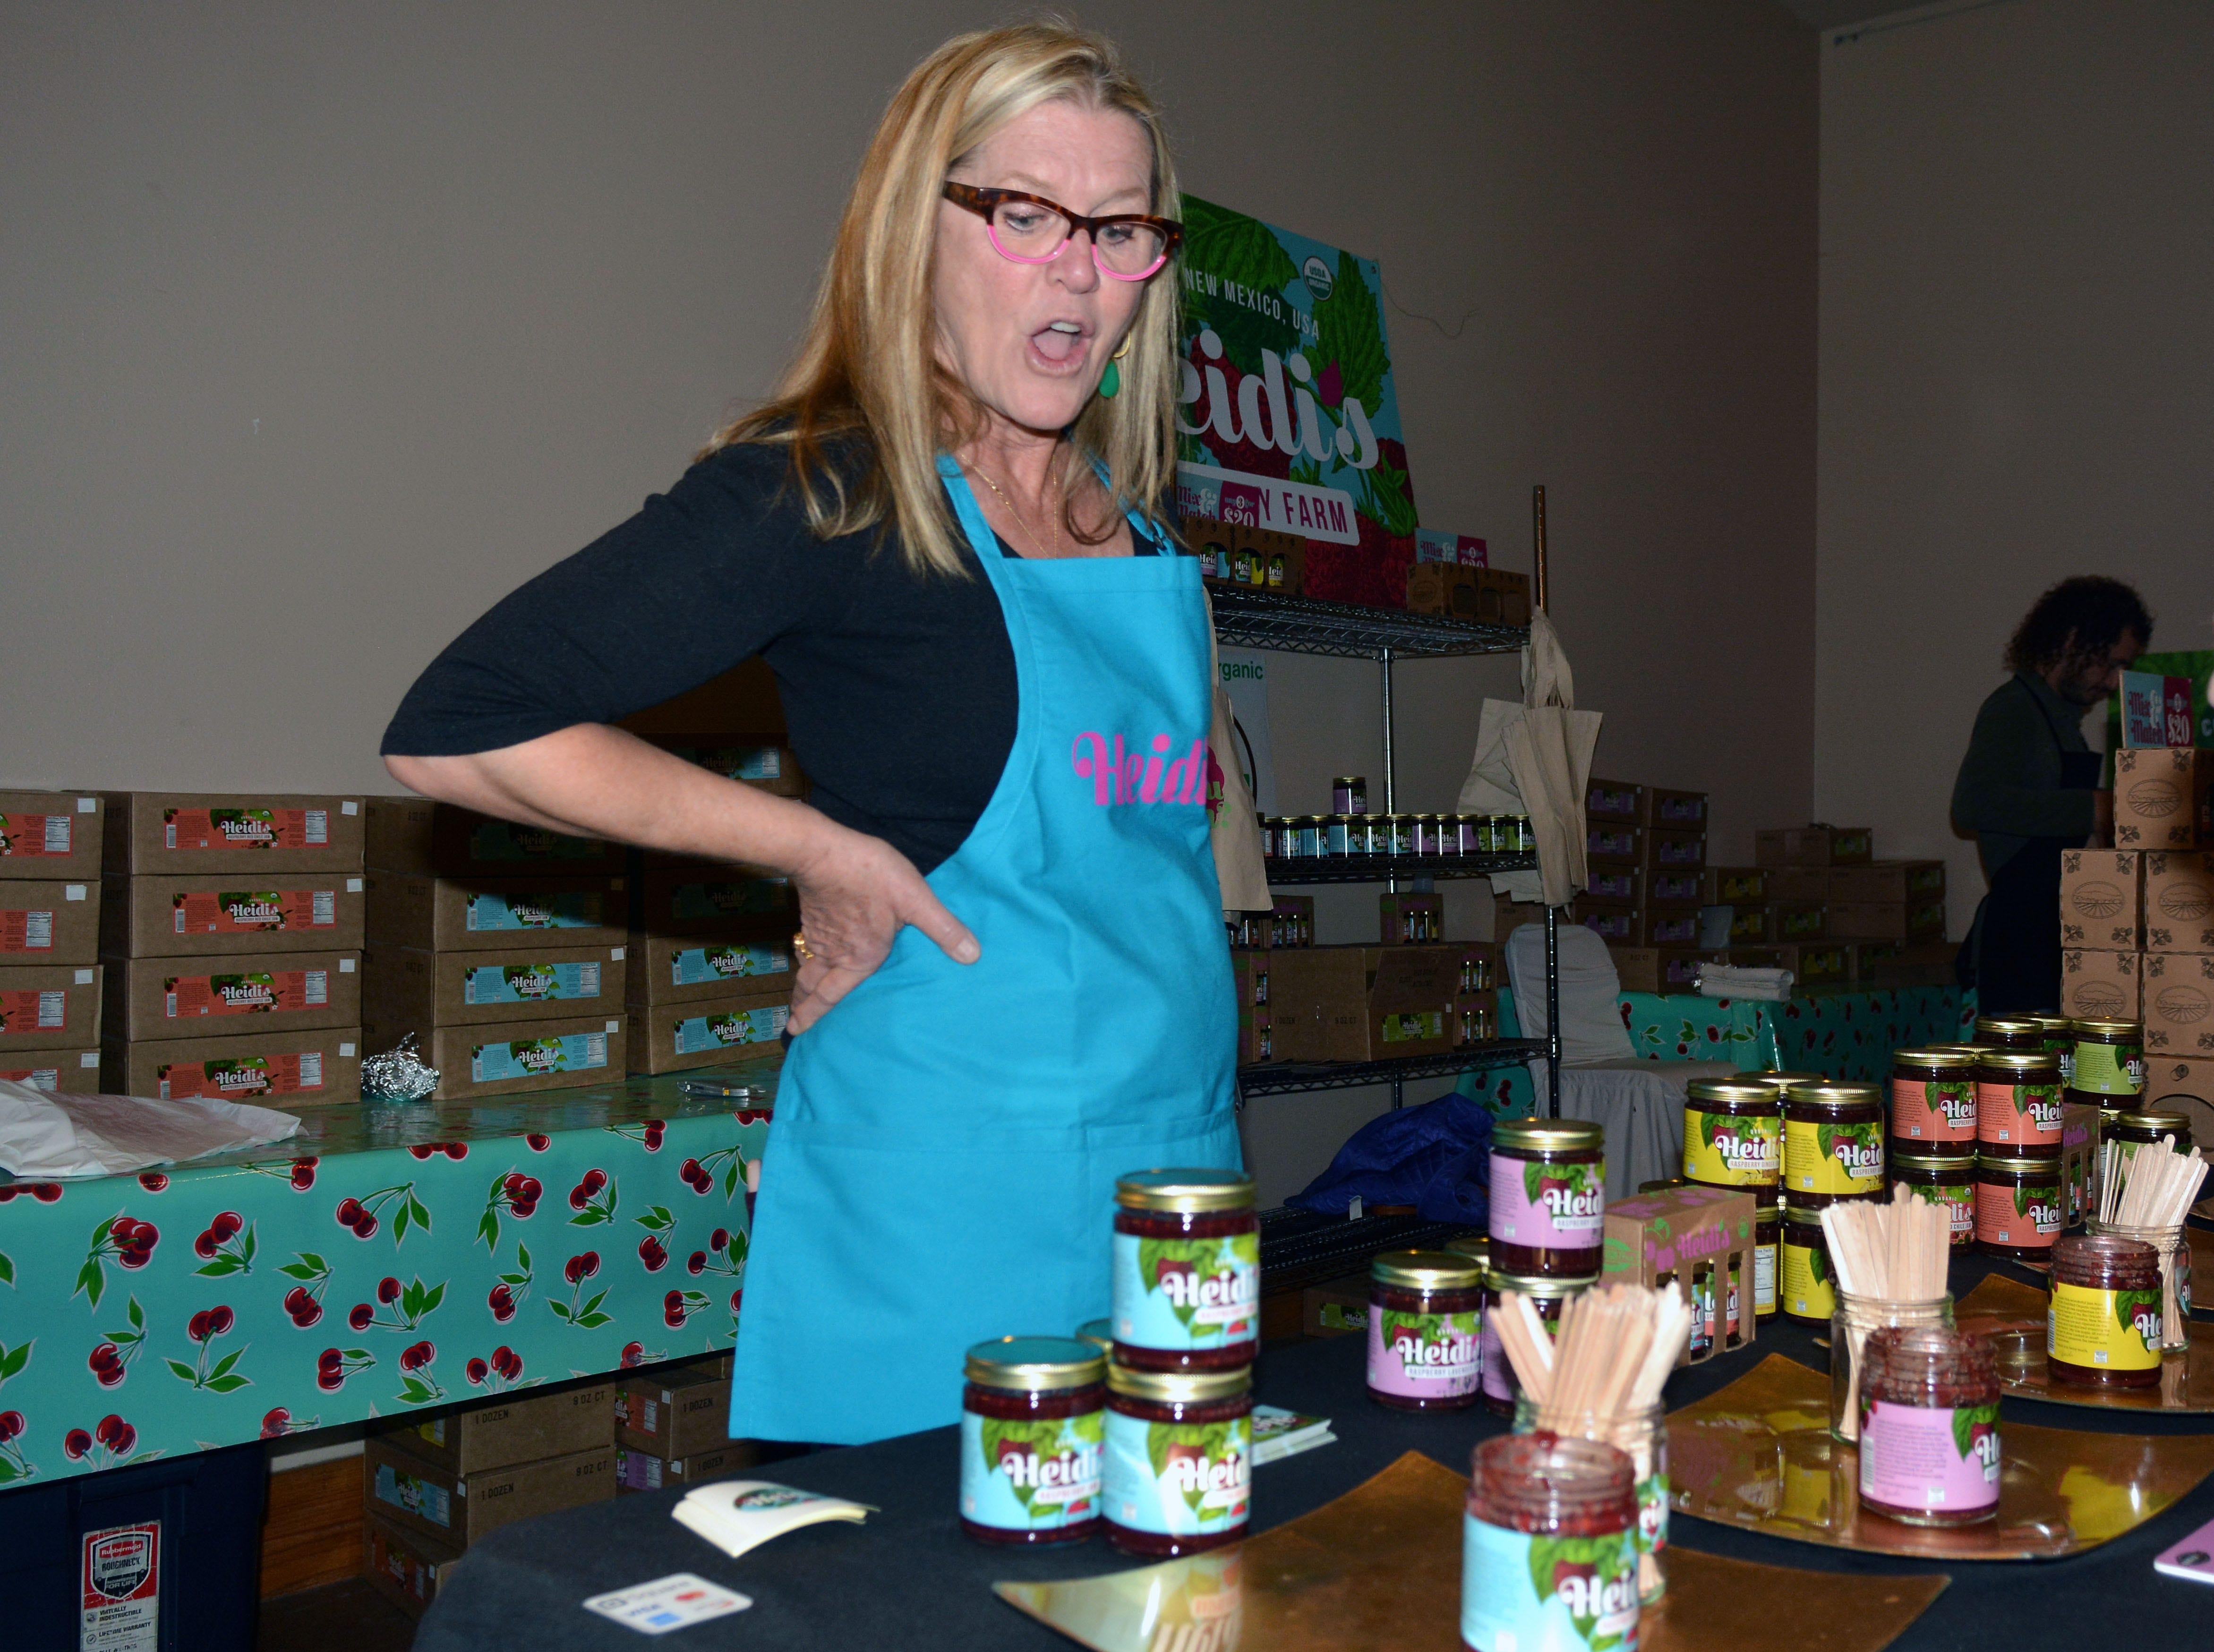 Heidi Eleftheriou of Heidi's Raspberry Farm from Corrales, NM displays her assortment of raspberry-based jams.  Photo taken 11/17/18.